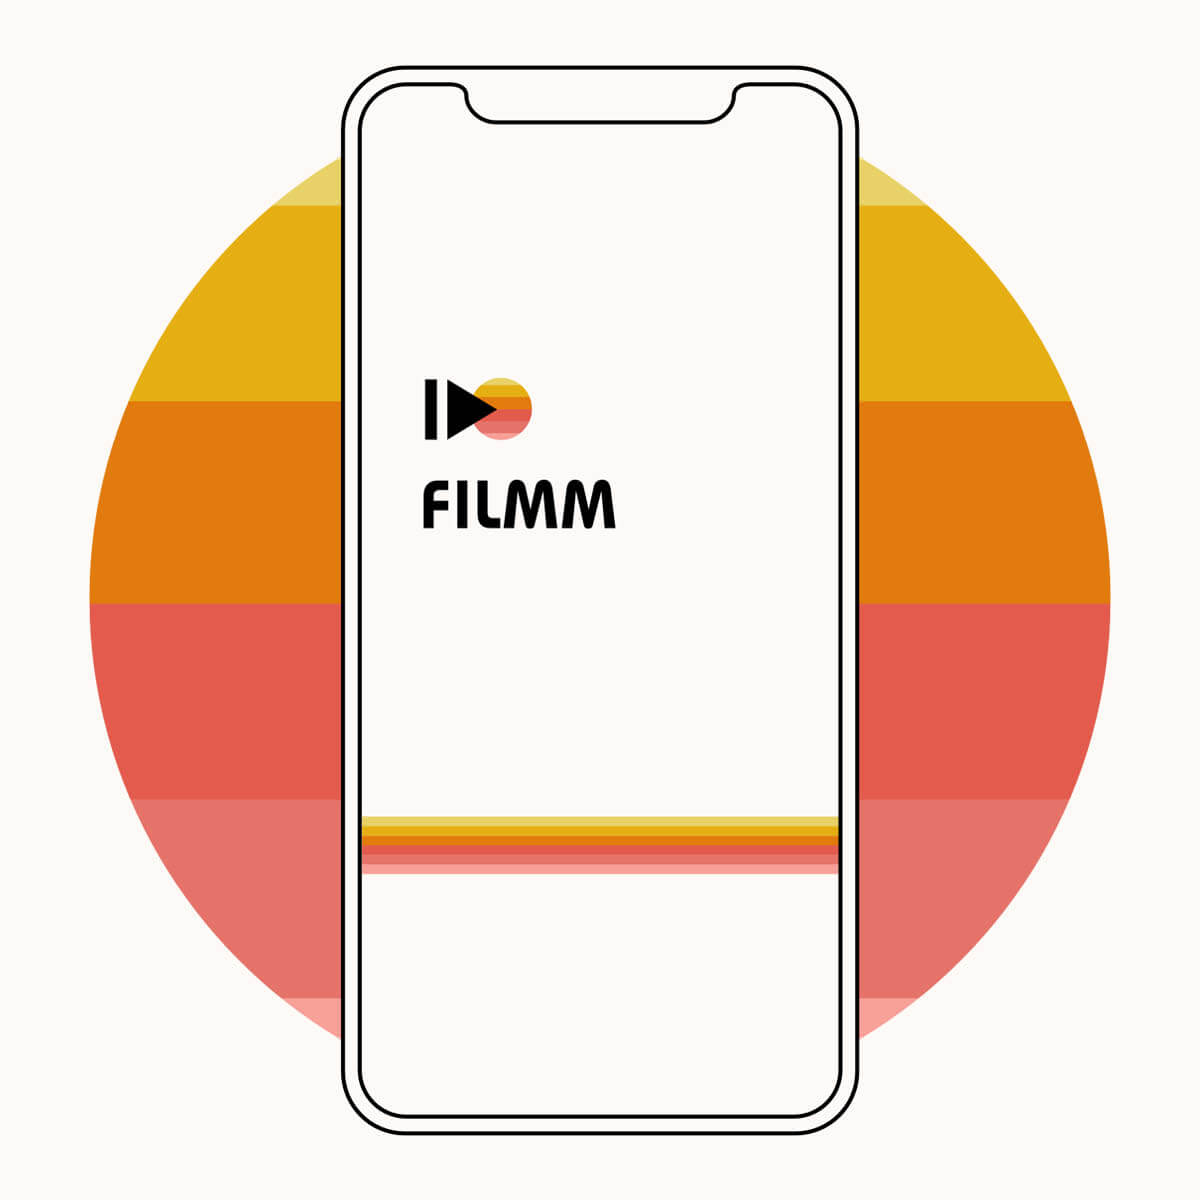 Filmm – Our New App!